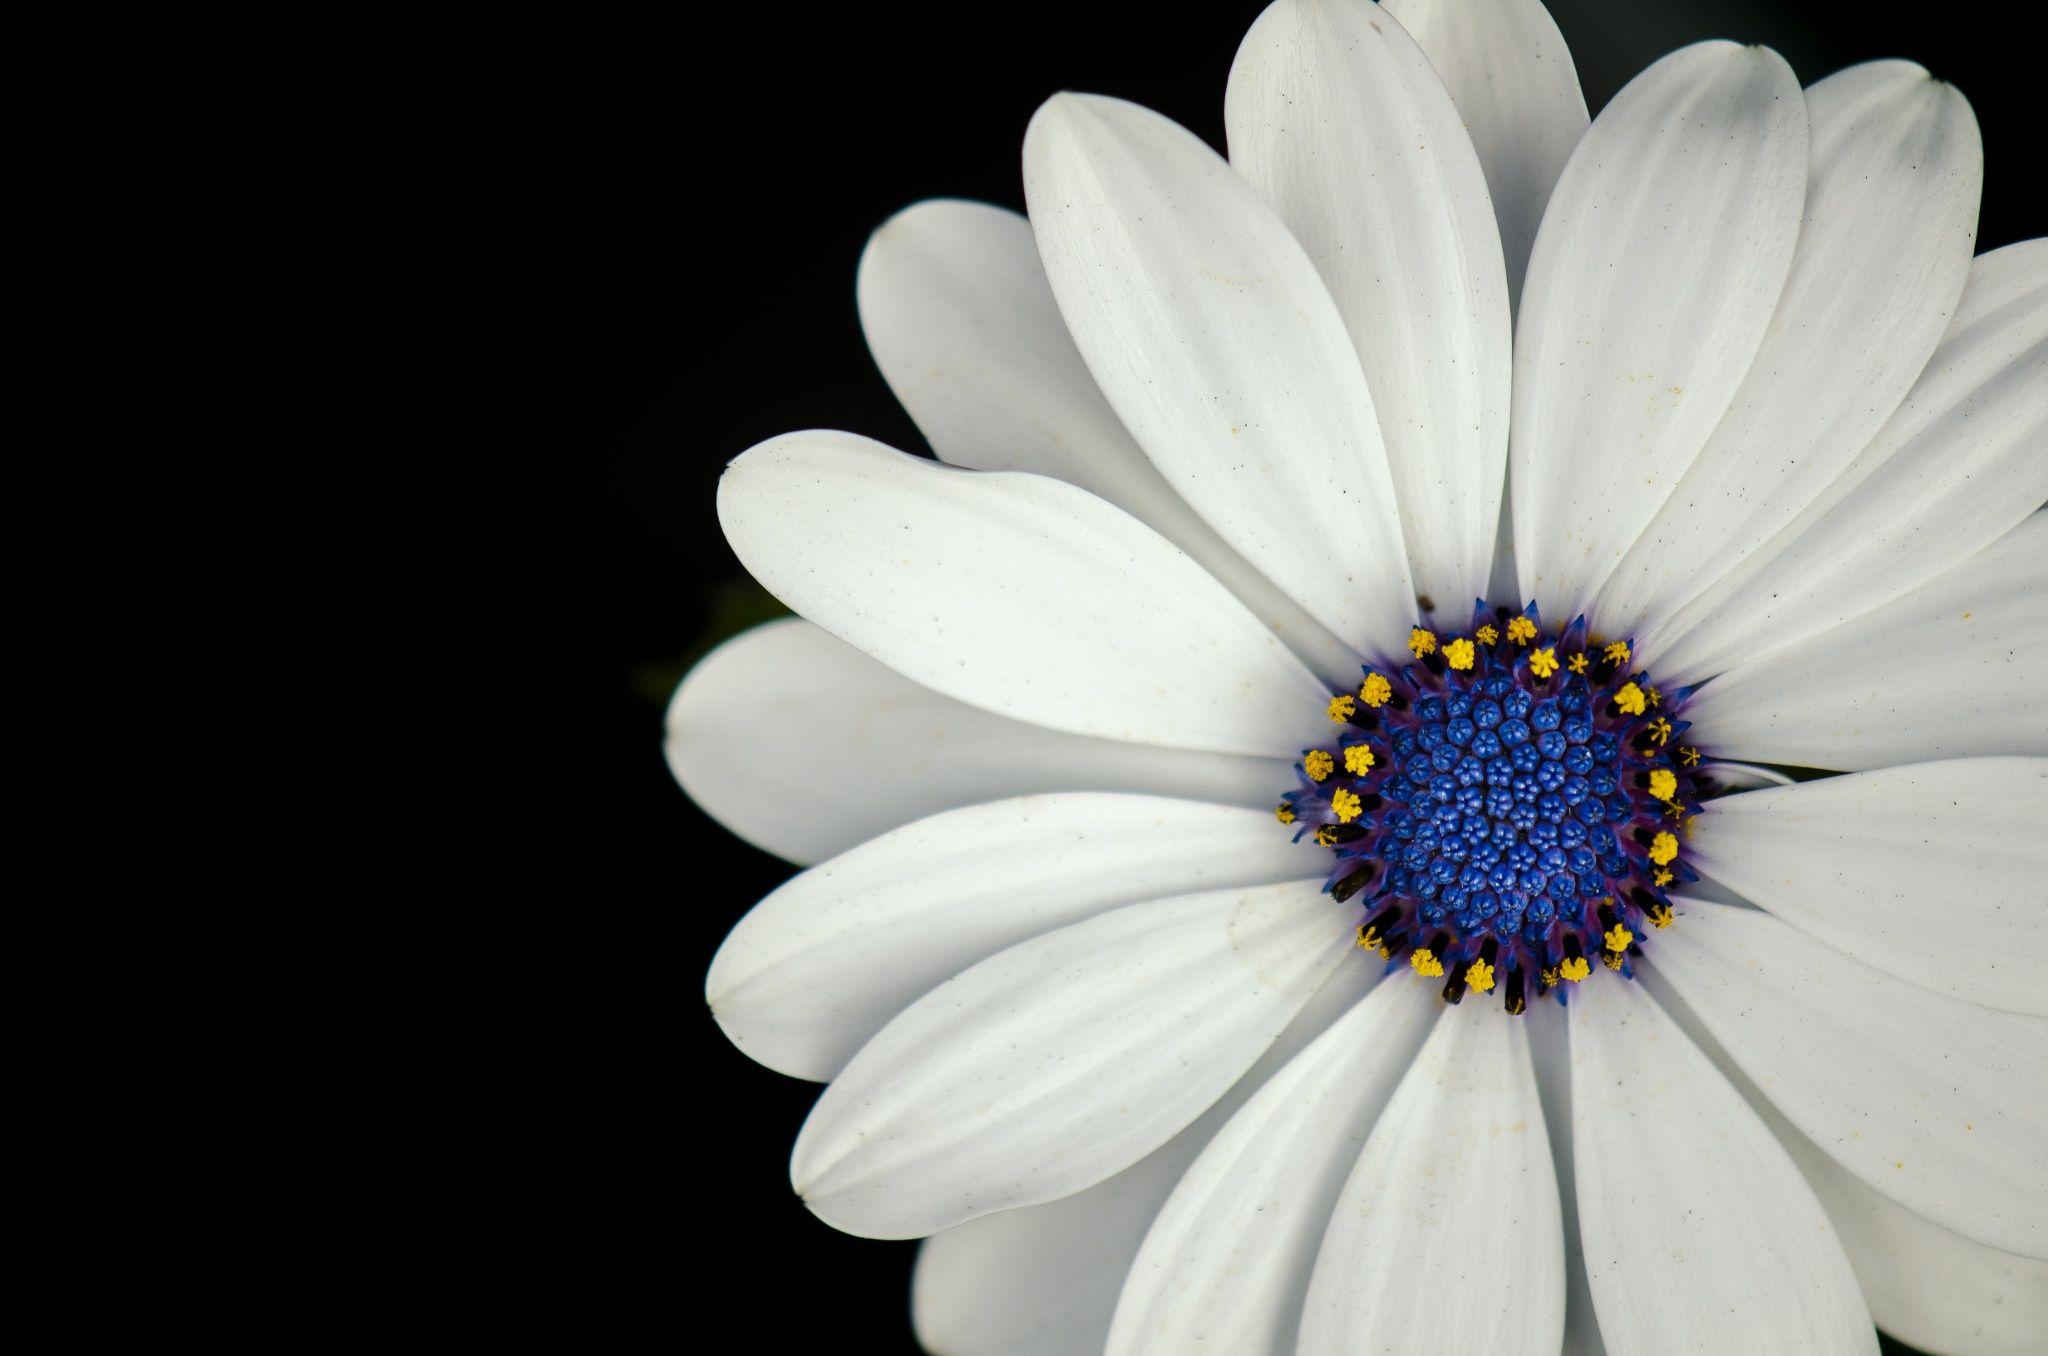 White flower with blue center david mccurry 500px photography white flower with blue center david mccurry 500px izmirmasajfo